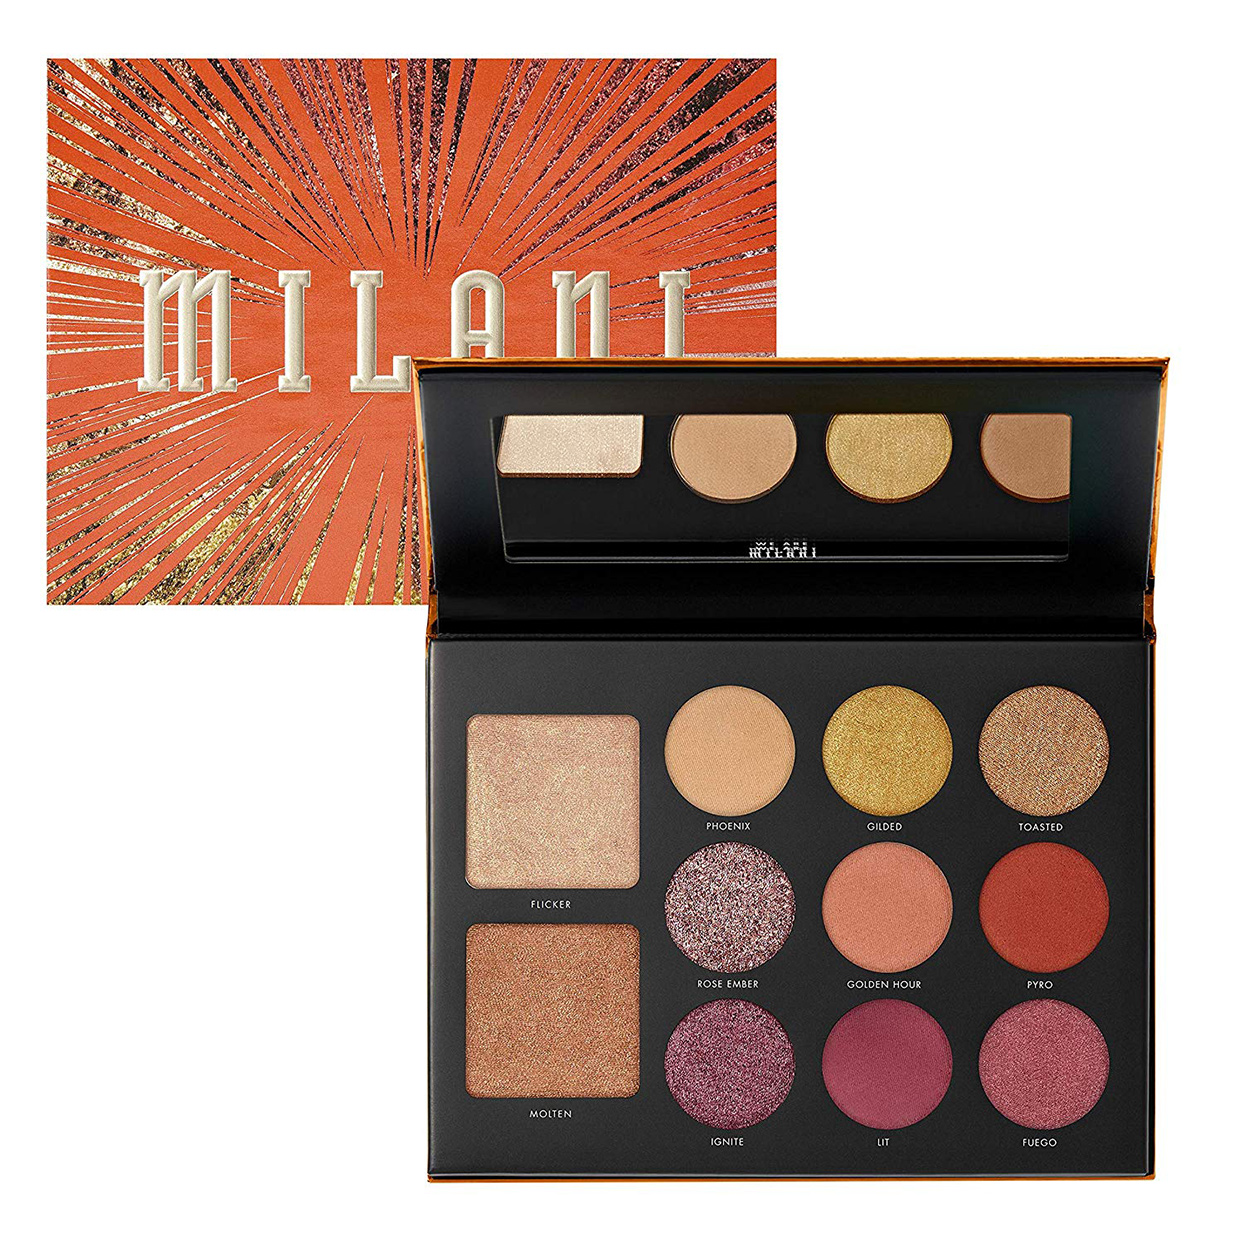 milani-gilded-ember-hyper-pigmented-face-eyeshadow-palette.jpg